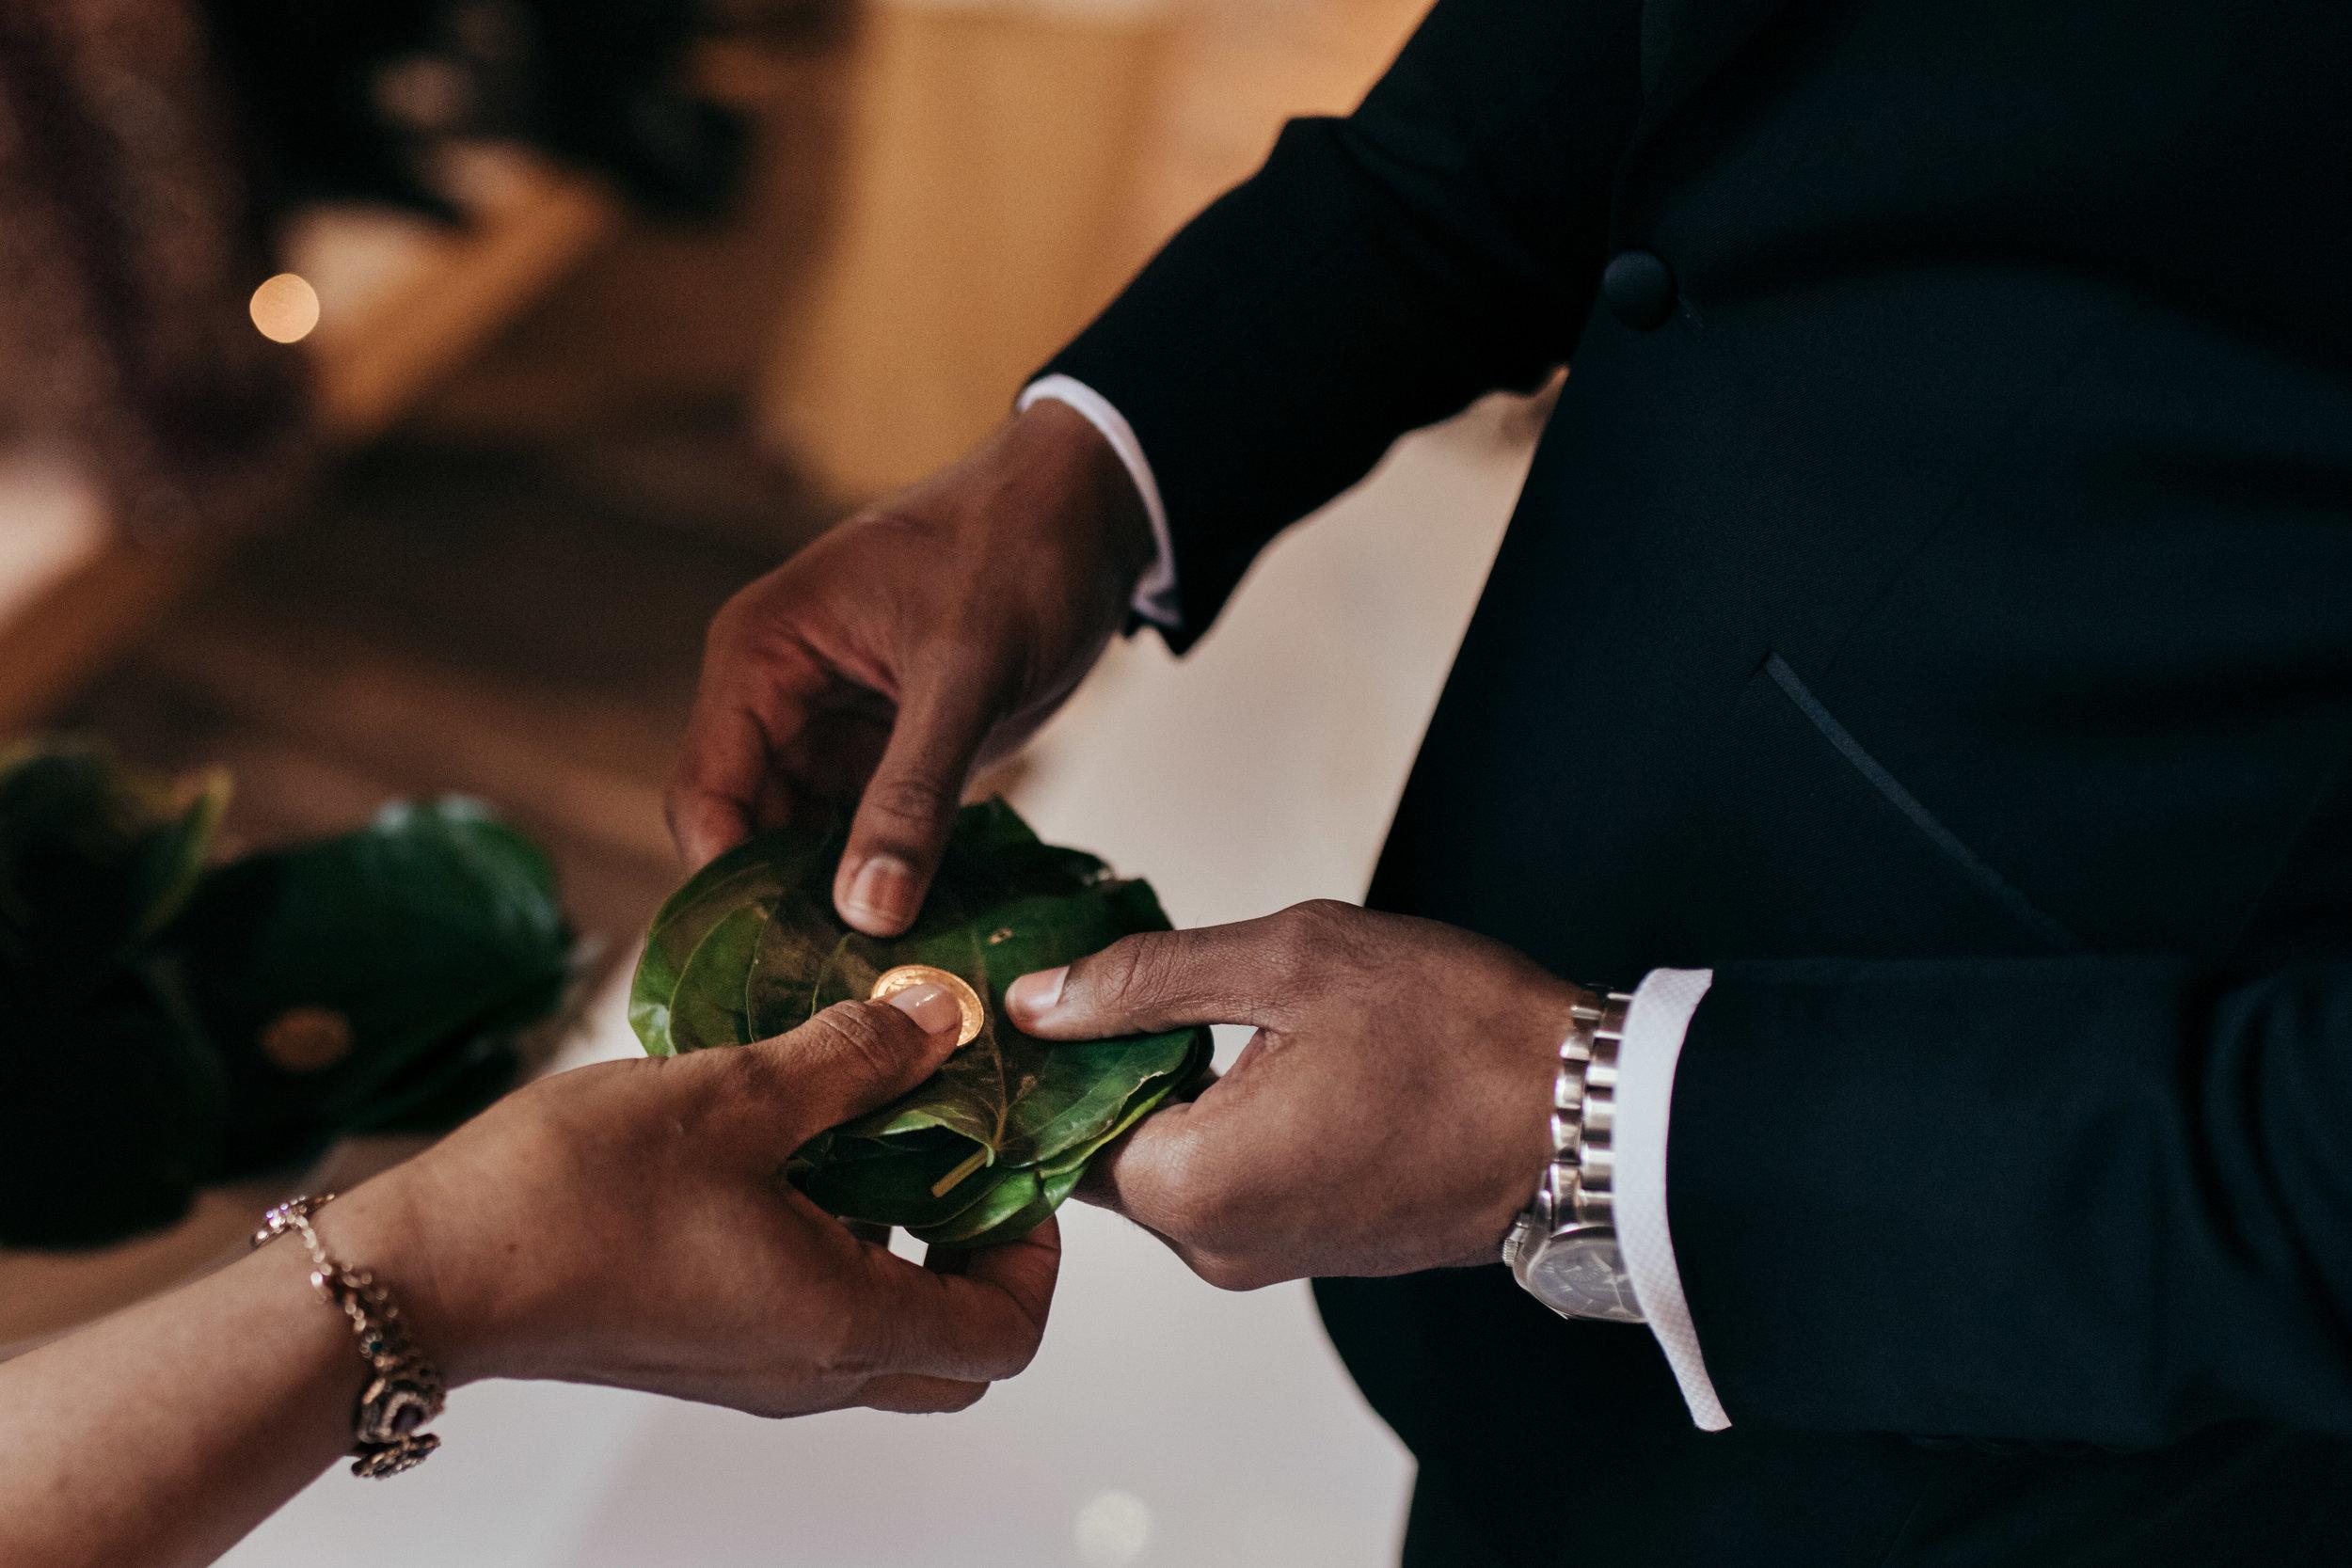 Mindy&Jared-wedding-by-LadiesAndGentlemen-by-Matija-Vuri-3730.jpg